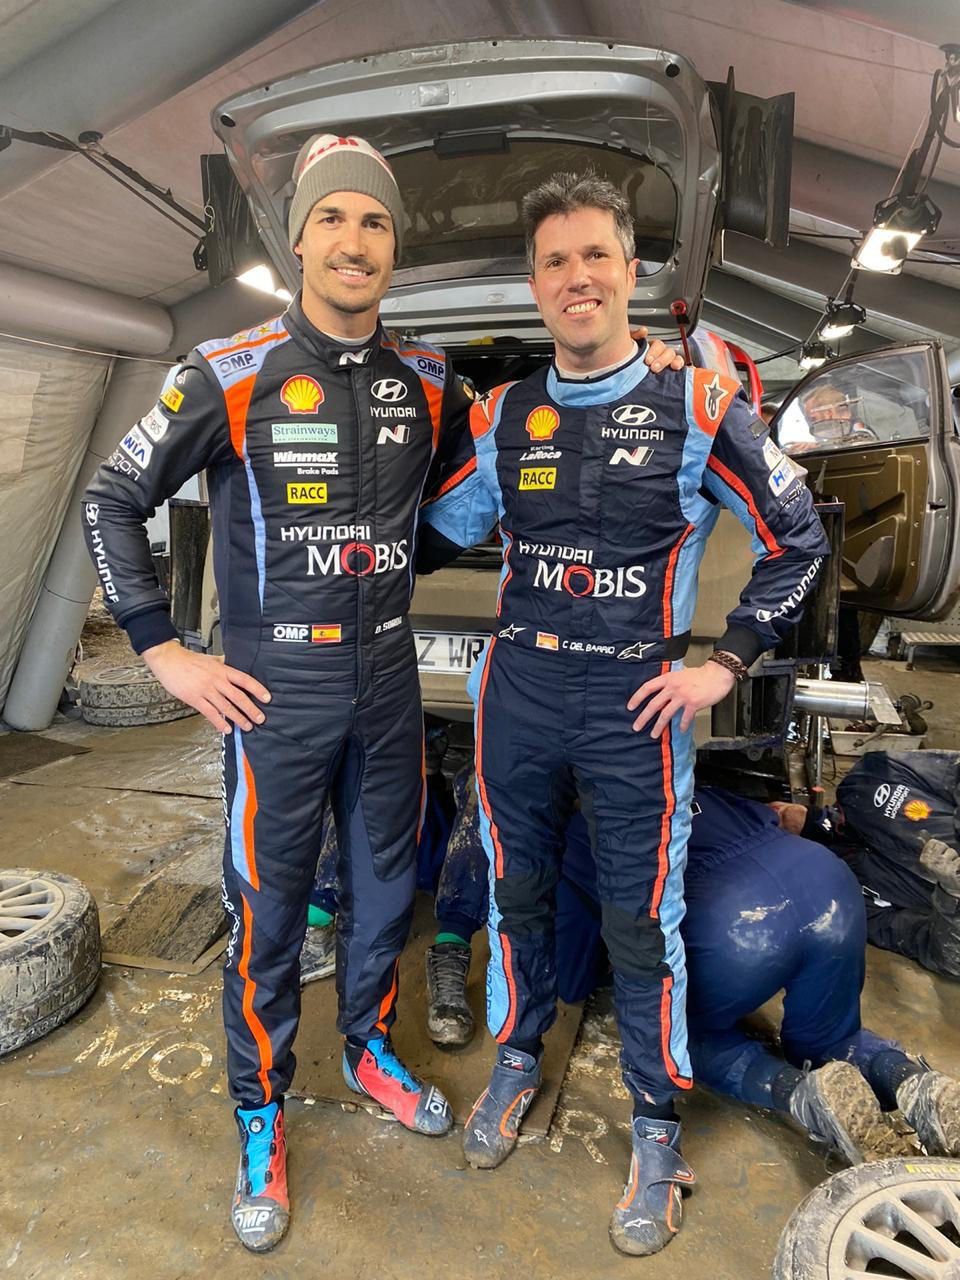 World Rally Championship: Temporada 2021  - Página 5 ErnwTQ_W8AME7Hd?format=jpg&name=large